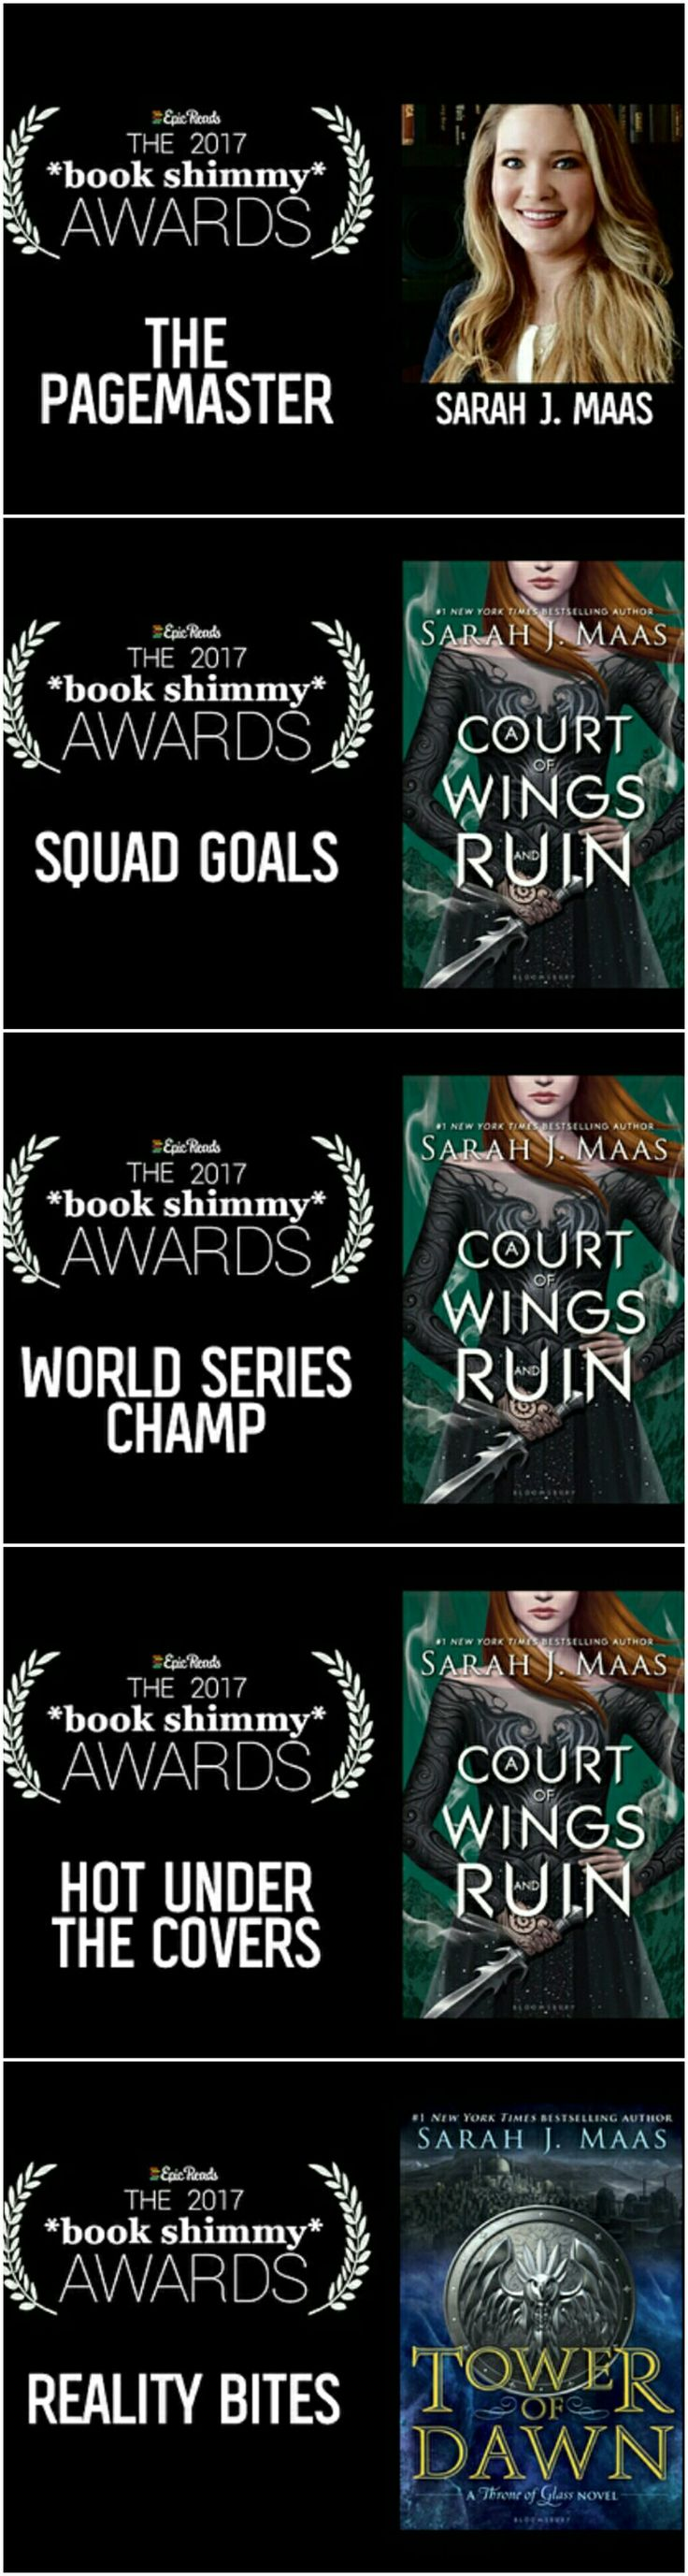 YAY. SARAH WON 5 AWARDS IN THE 2017 BOOK SHIMMY. Photo assembled by sarahjmaasbxtch_ on instagram/ fxrehearttt on pinterest.